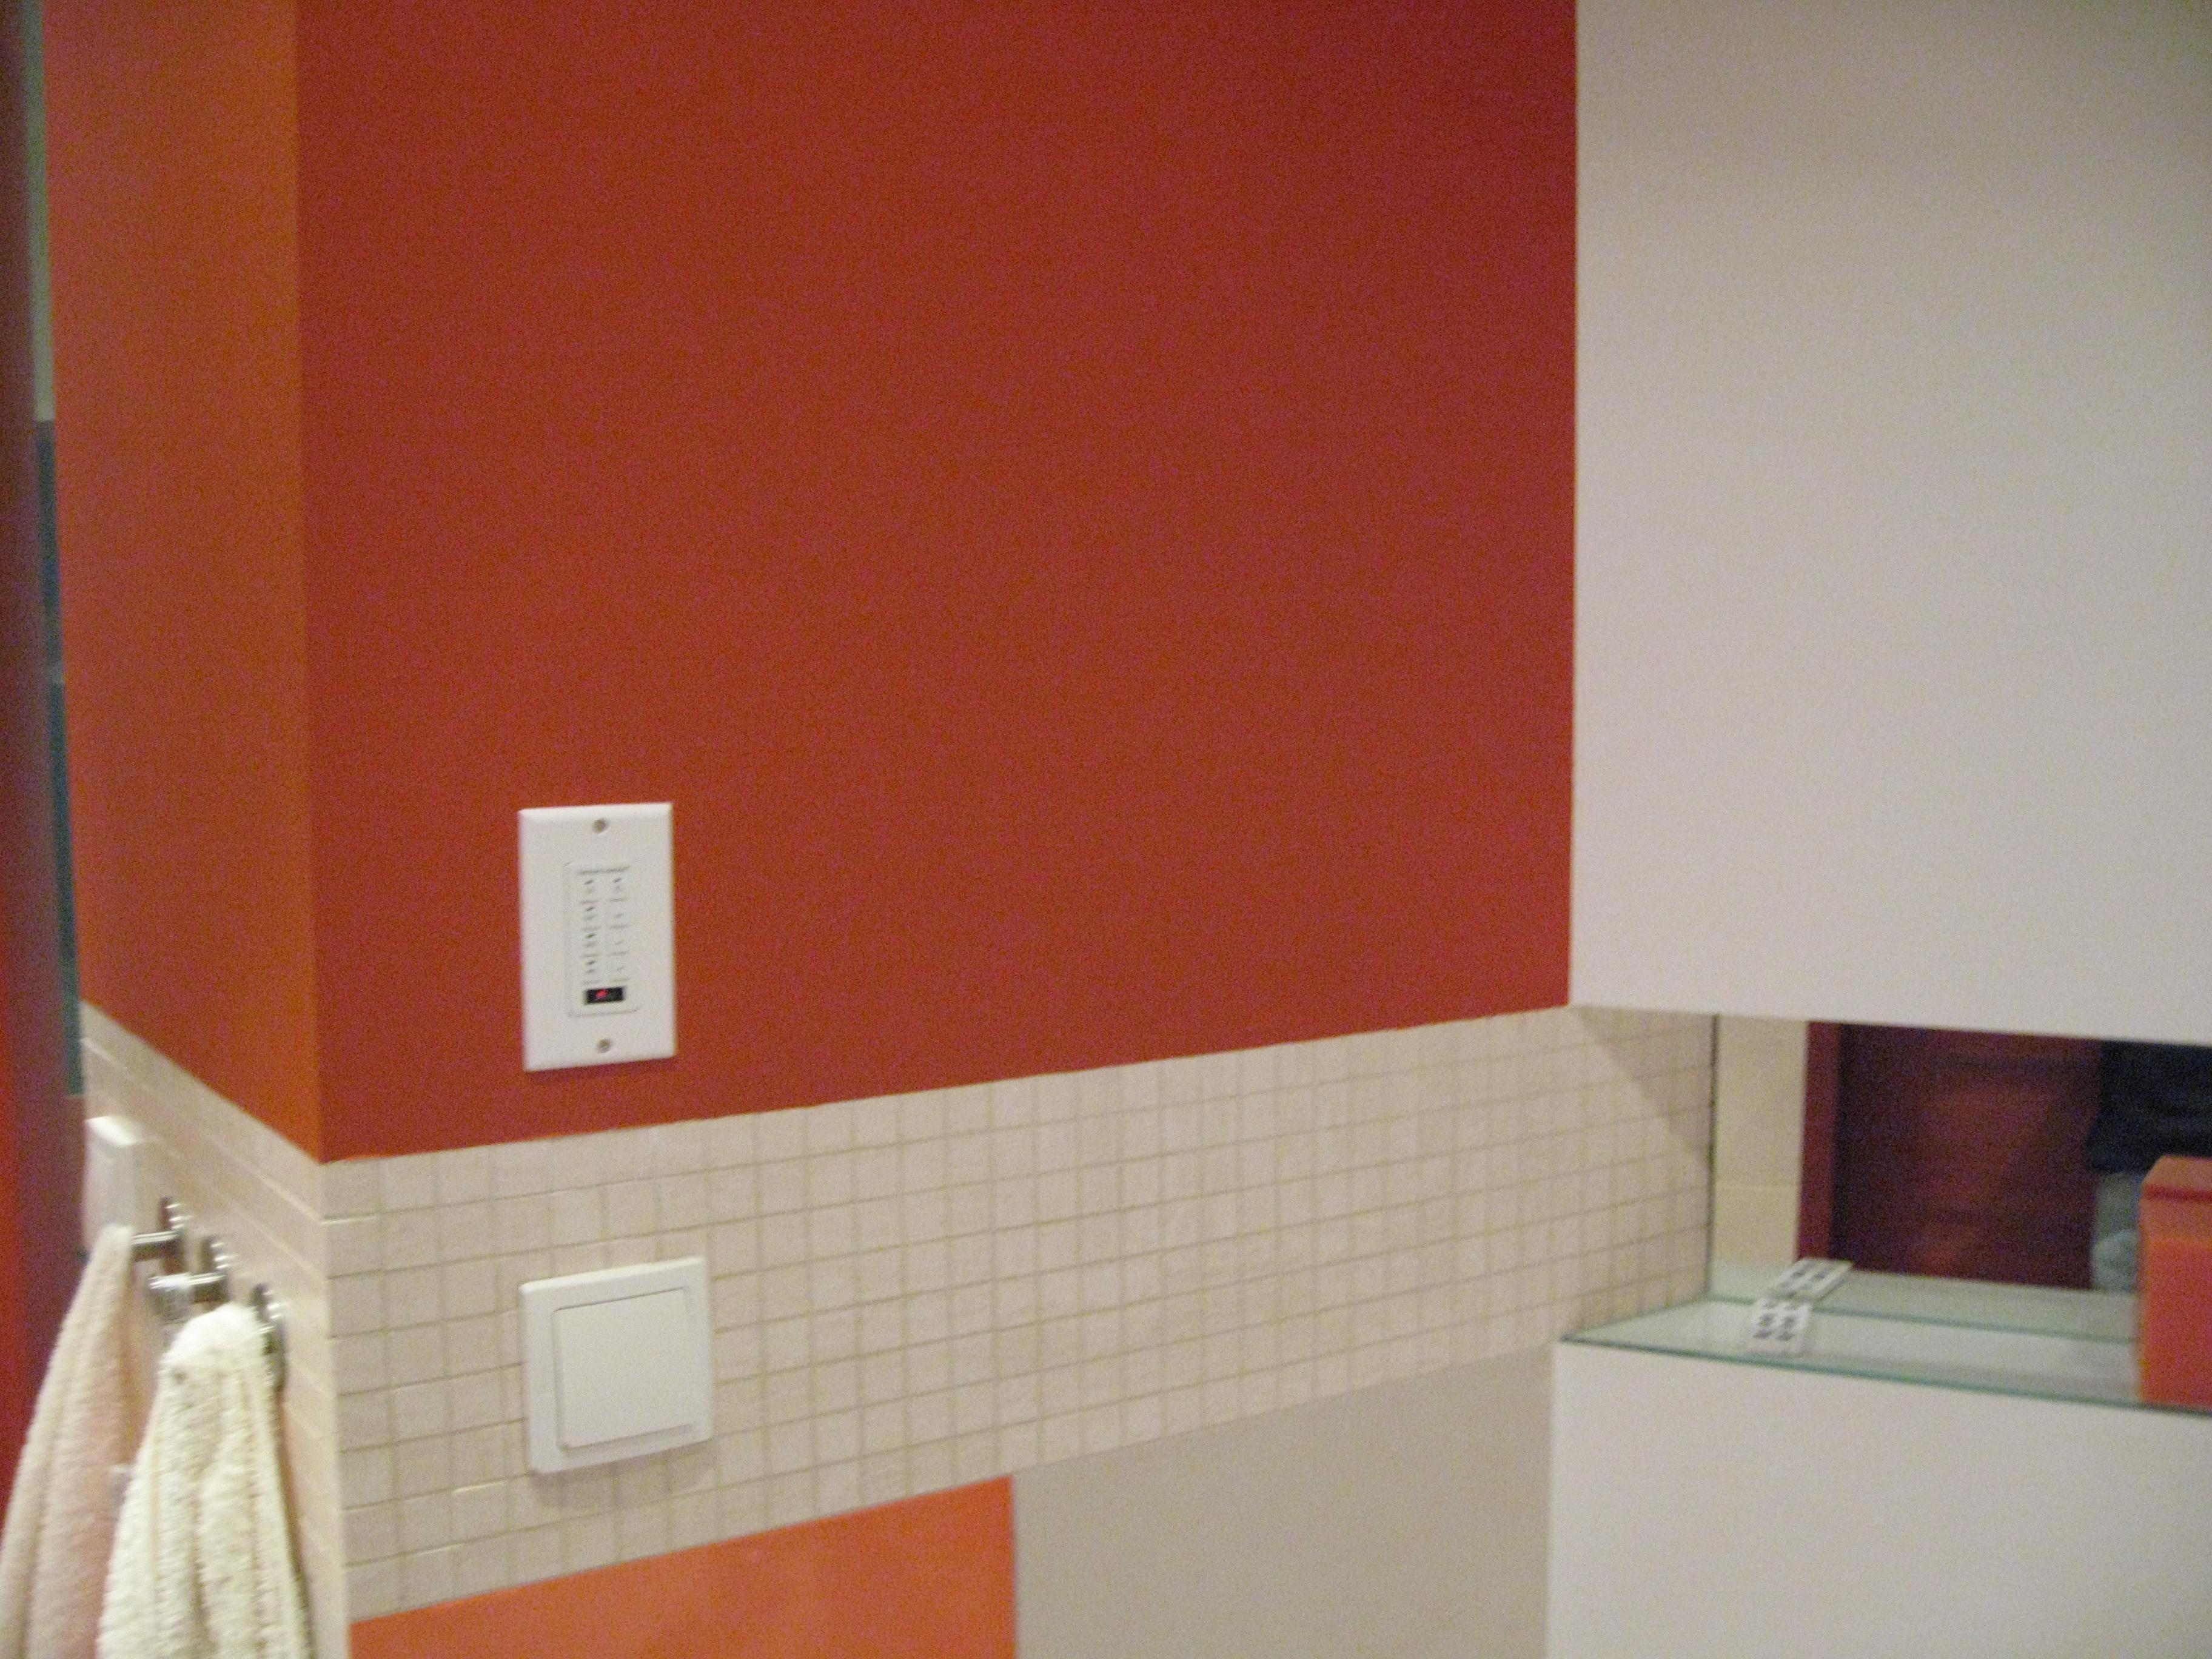 Klawiatura systemu multiroom - łazienka I